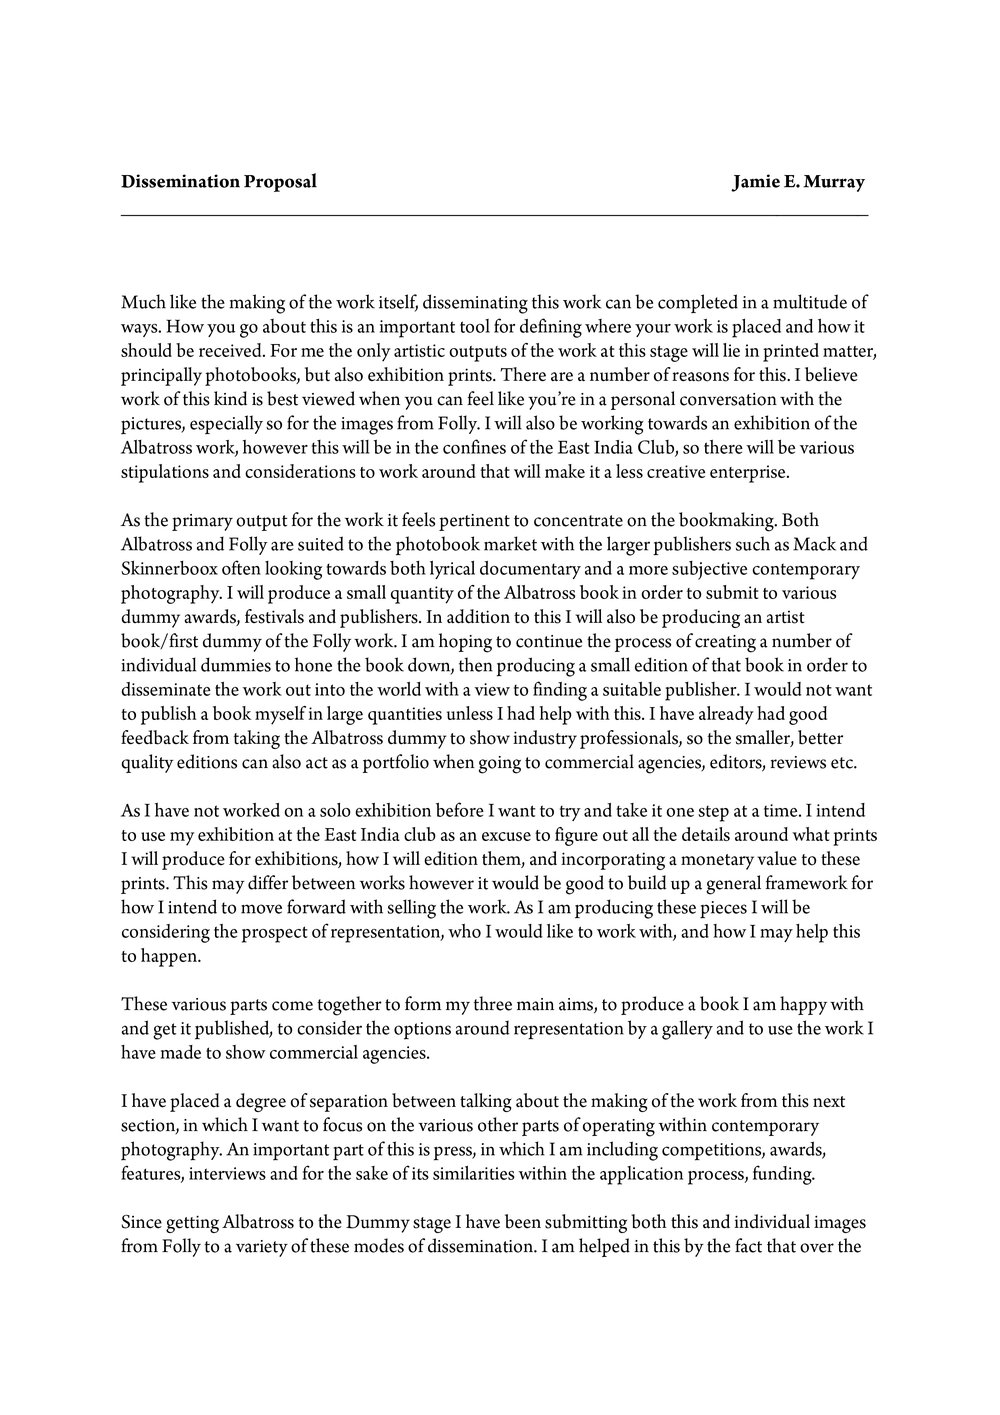 Dissemination Proposal-1.jpg